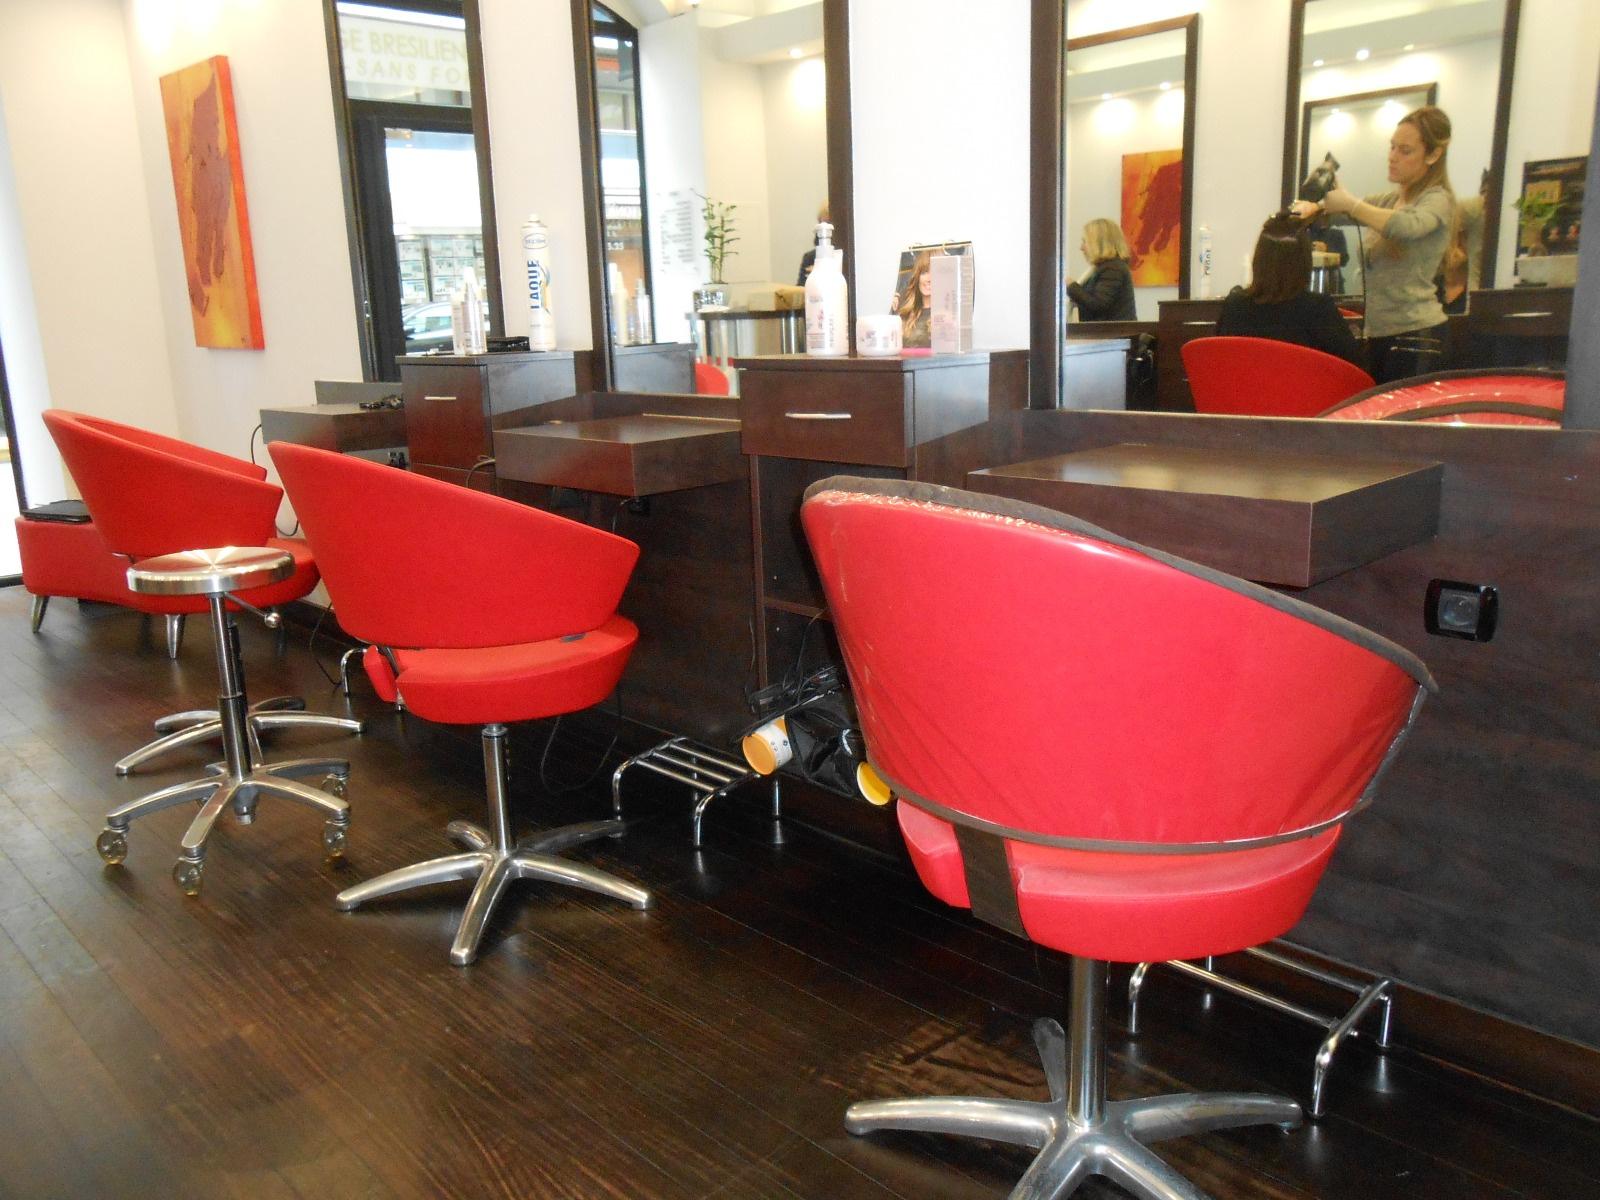 Vente salon de coiffure nice 06000 riviera commerces for Achat salon coiffure